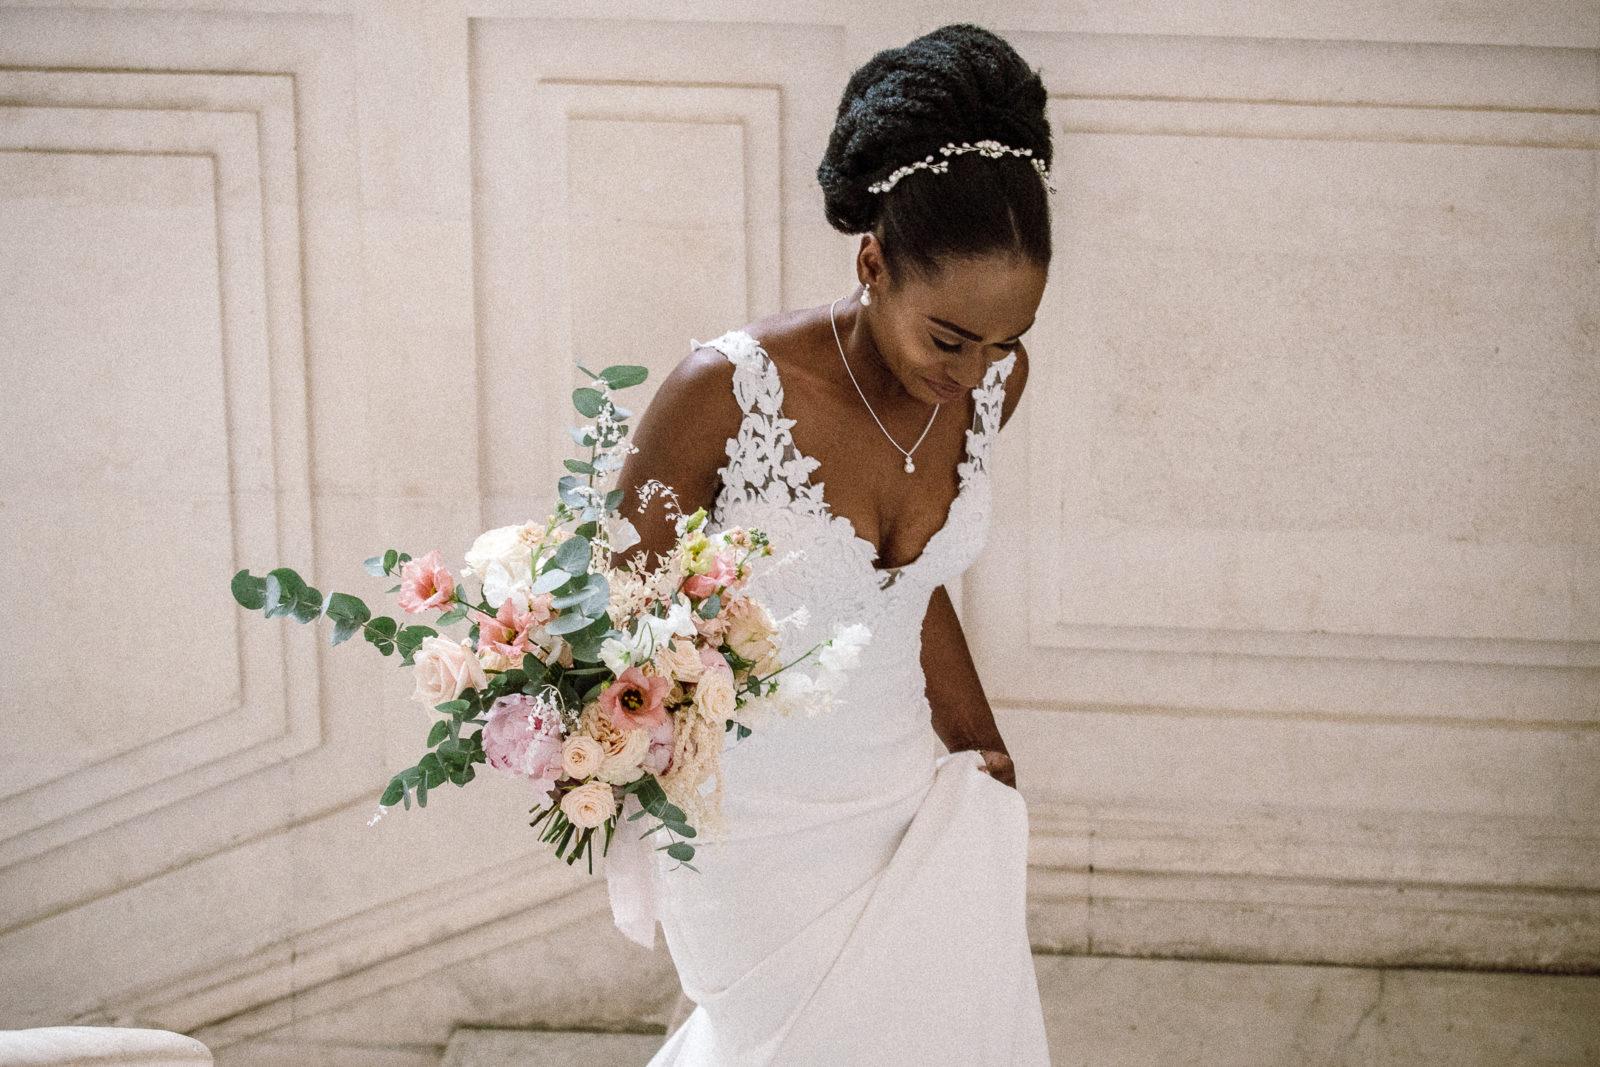 mariage-elegant-vegetal-photographe-ludozme-weddingplanner-eduadecore-scénograpie-florale (19)